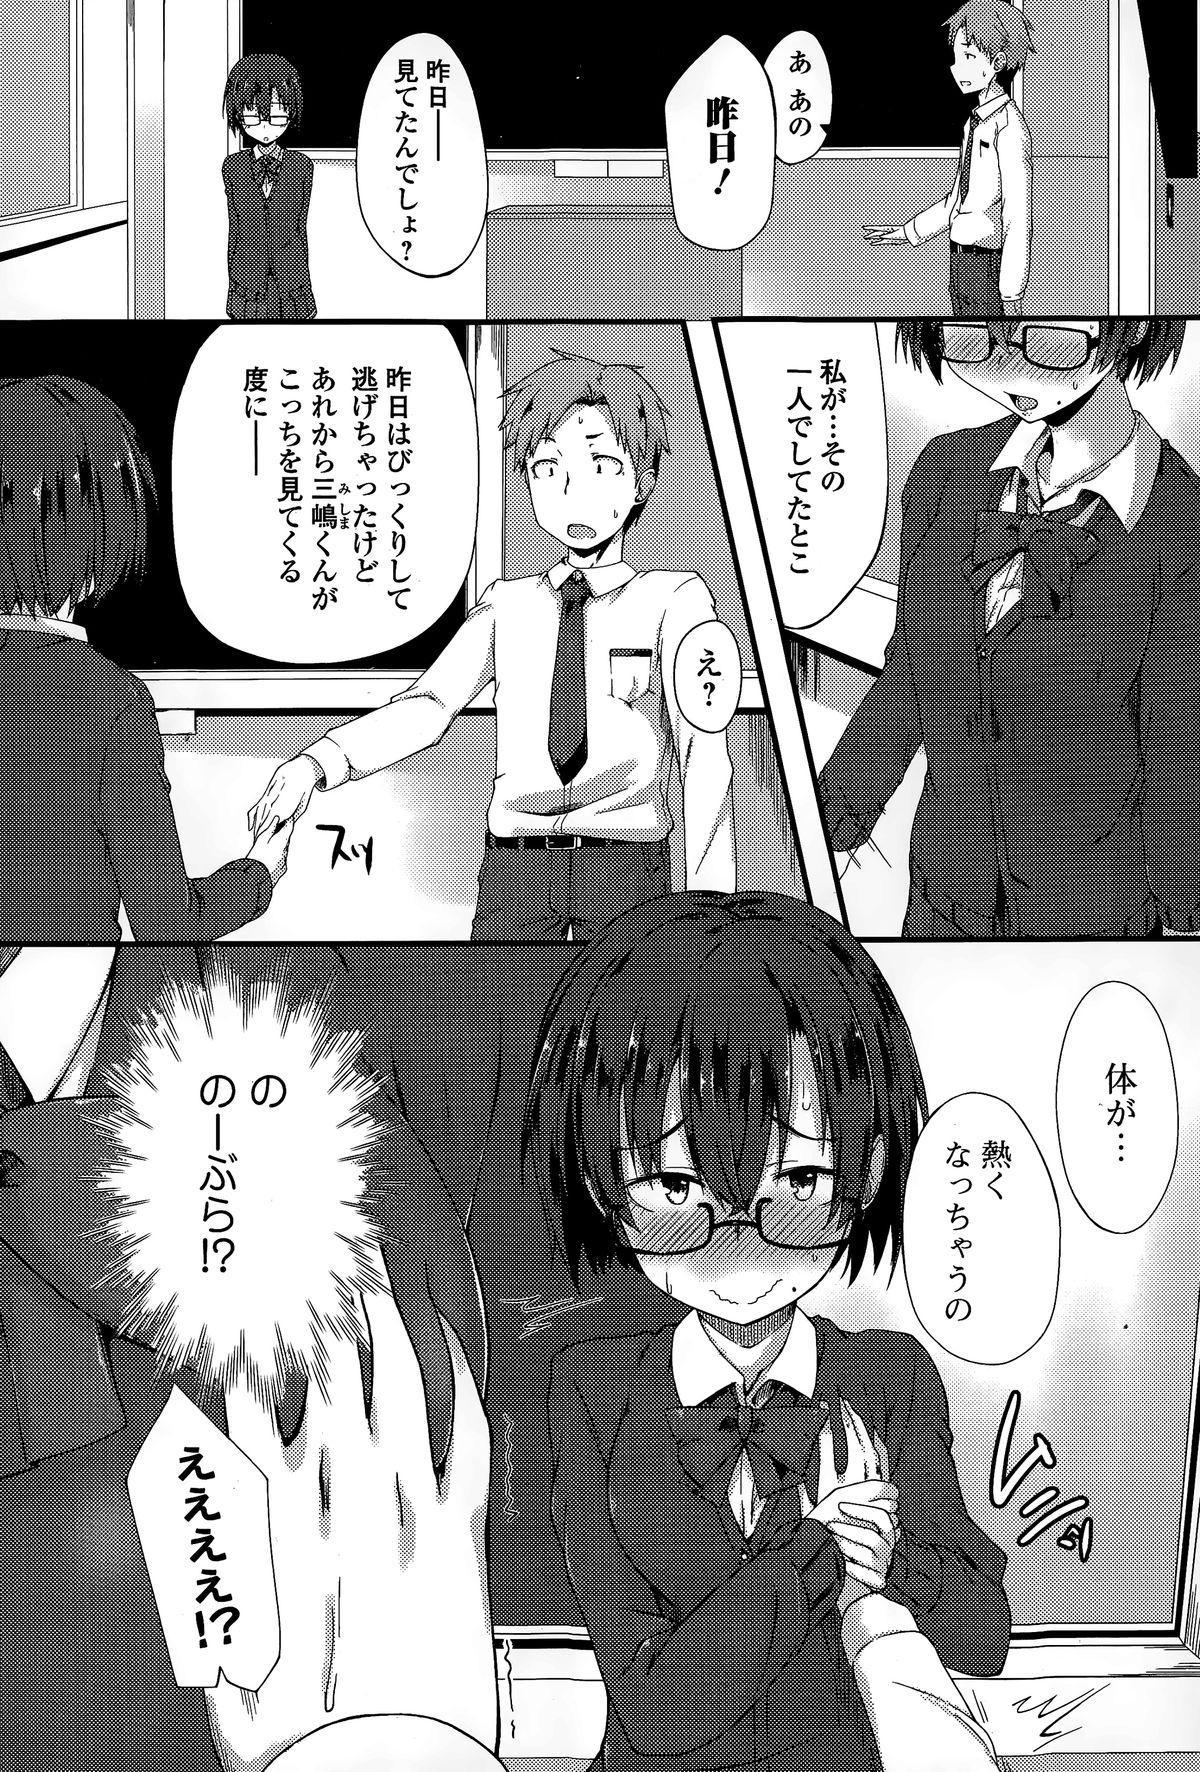 Comic Toutetsu 2015-02 Vol. 3 207